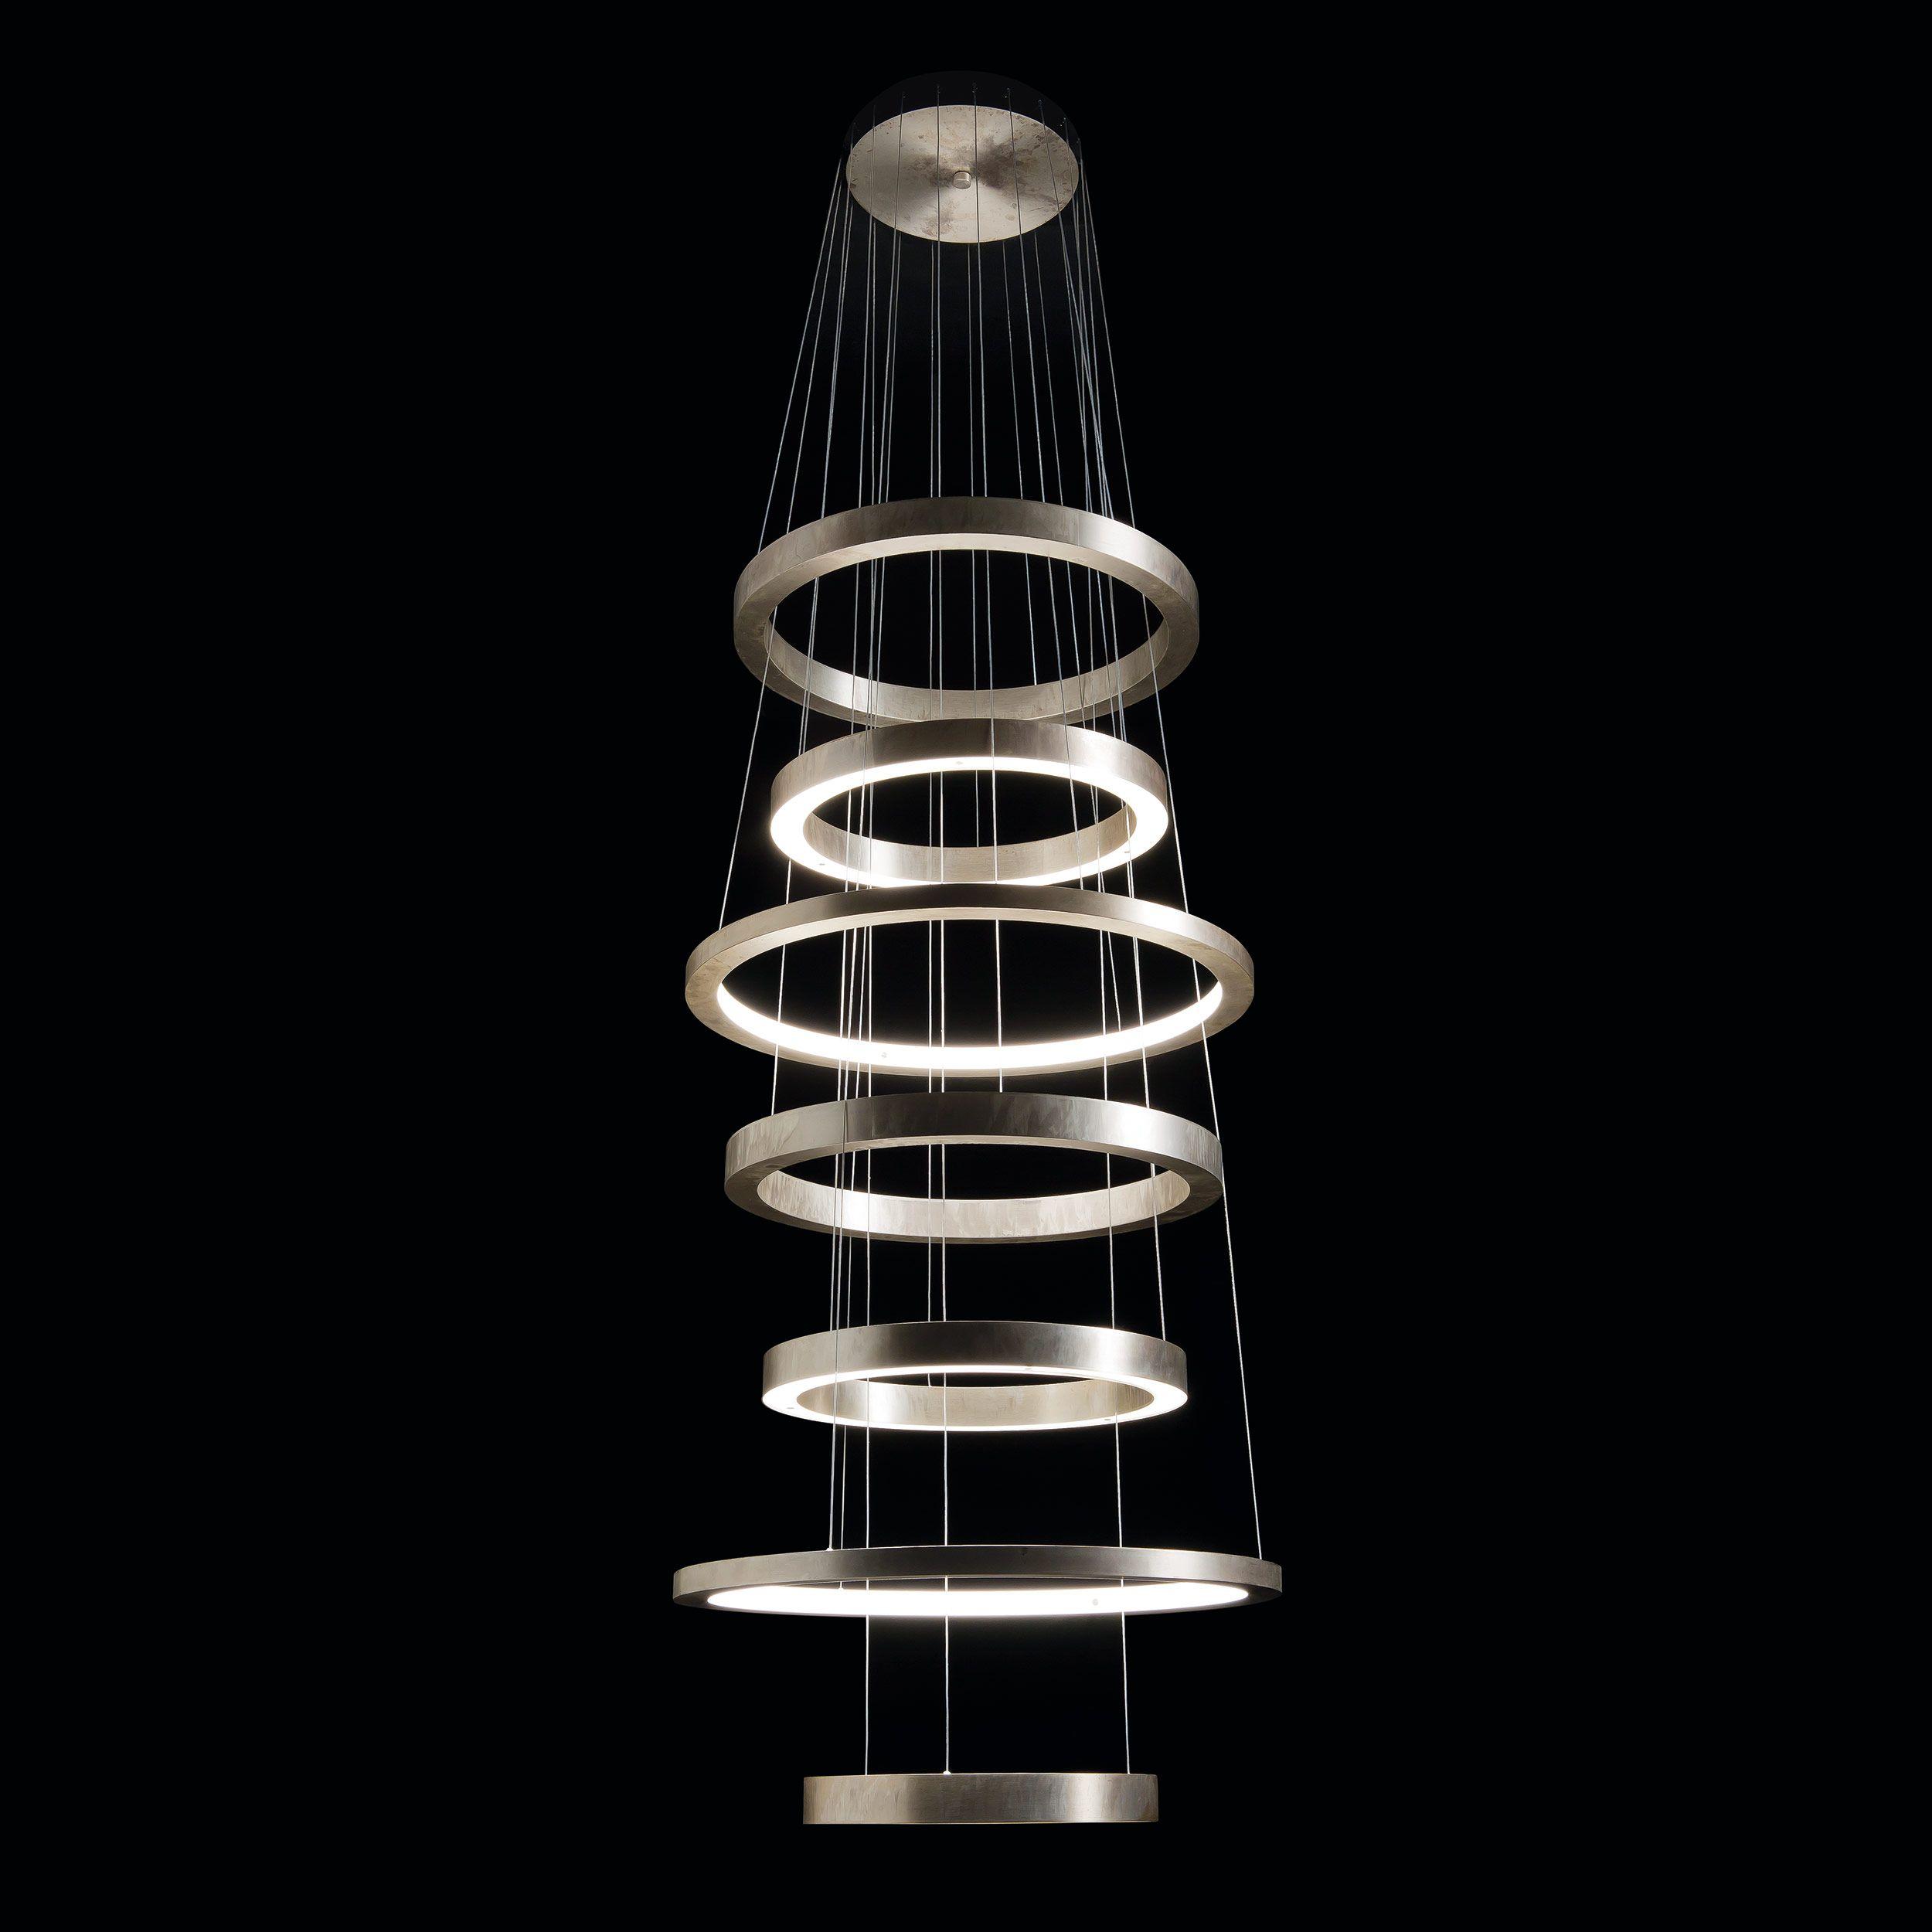 Henge light ring slim xxl brass pendant led light several henge light ring slim xxl brass pendant led light several compositions handmade designed parisarafo Choice Image